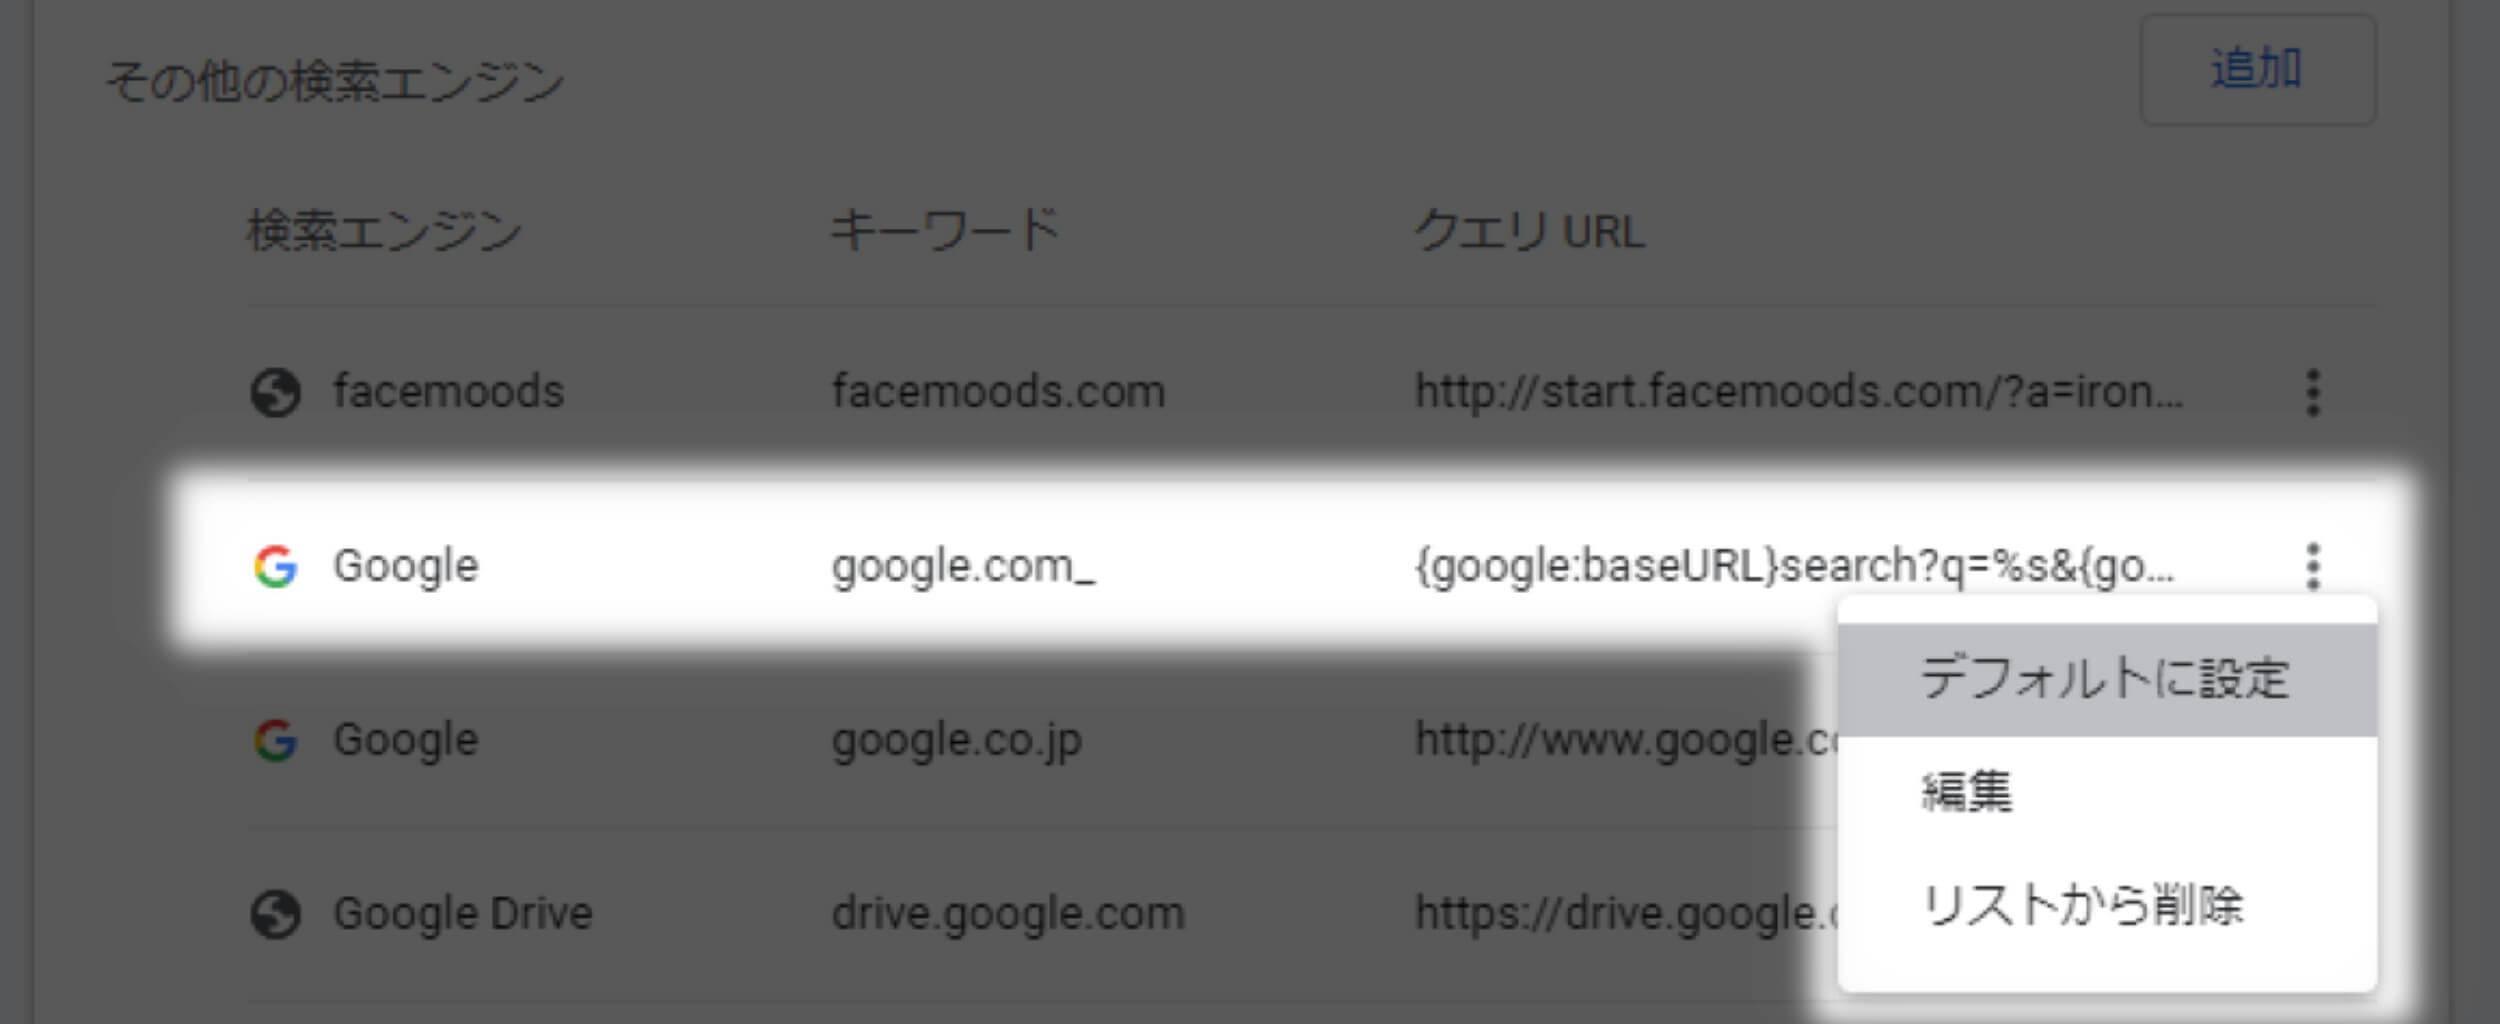 GoogleChrome設定→検索エンジン→Googleをデフォルトに設定